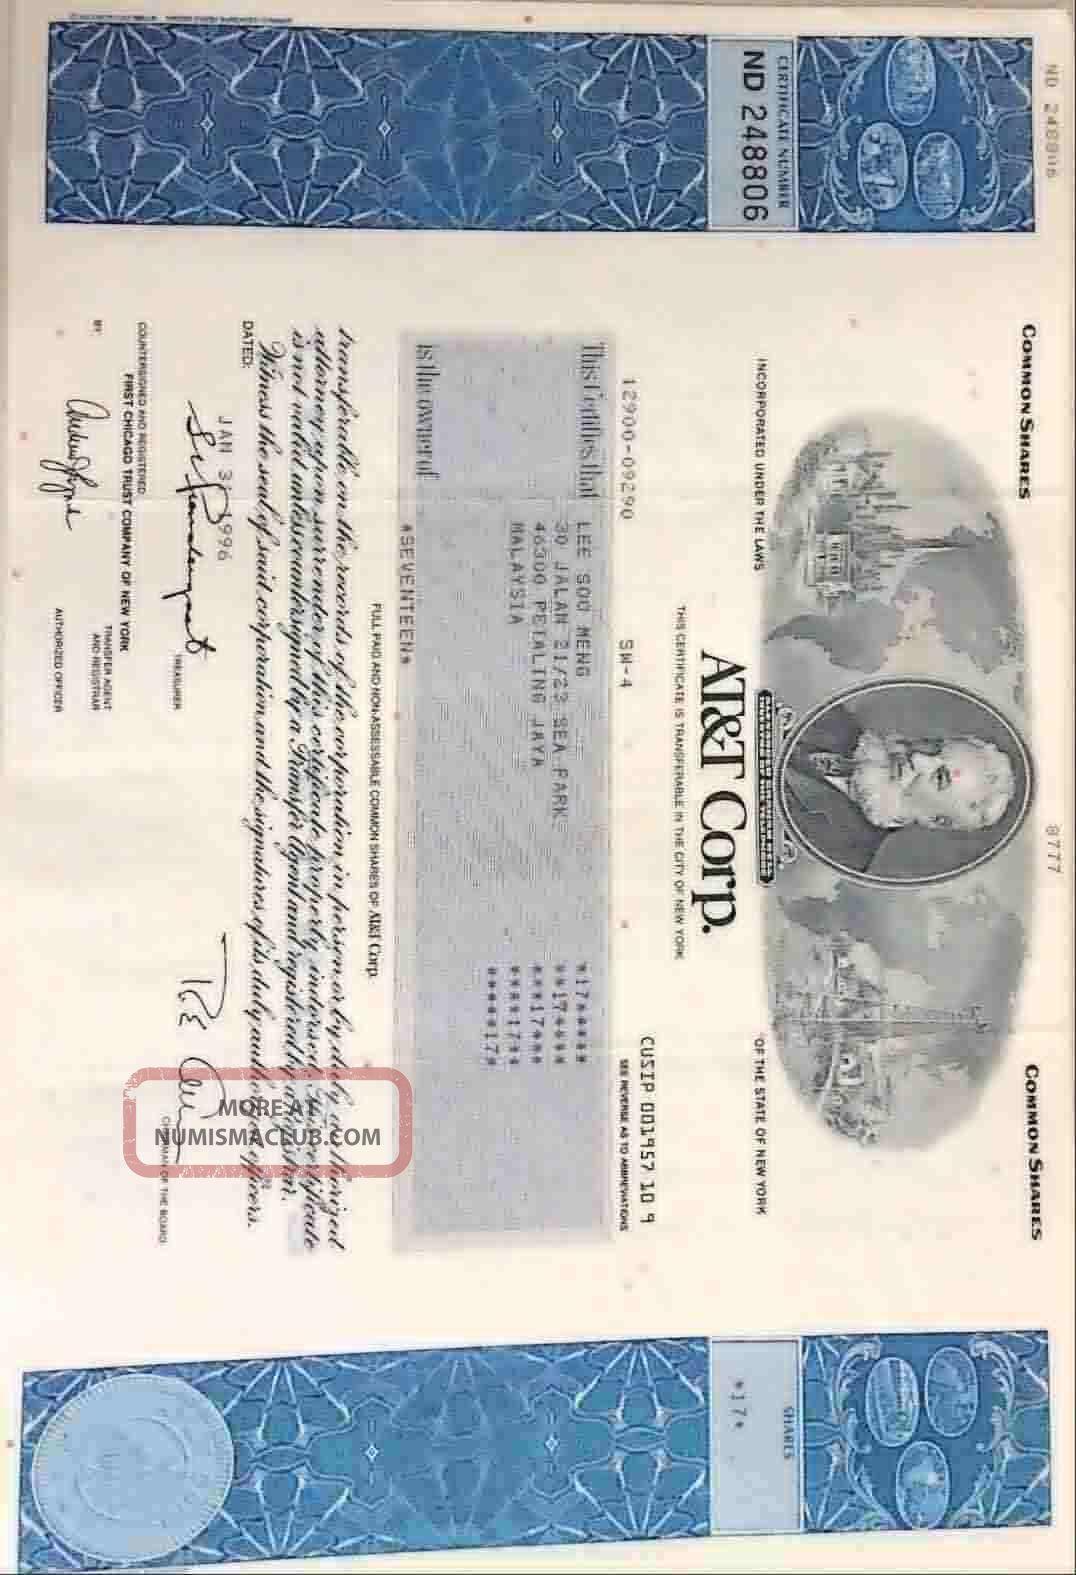 American Telephone & Telegraph Company Stock Certificate (at&t) Stocks & Bonds, Scripophily photo